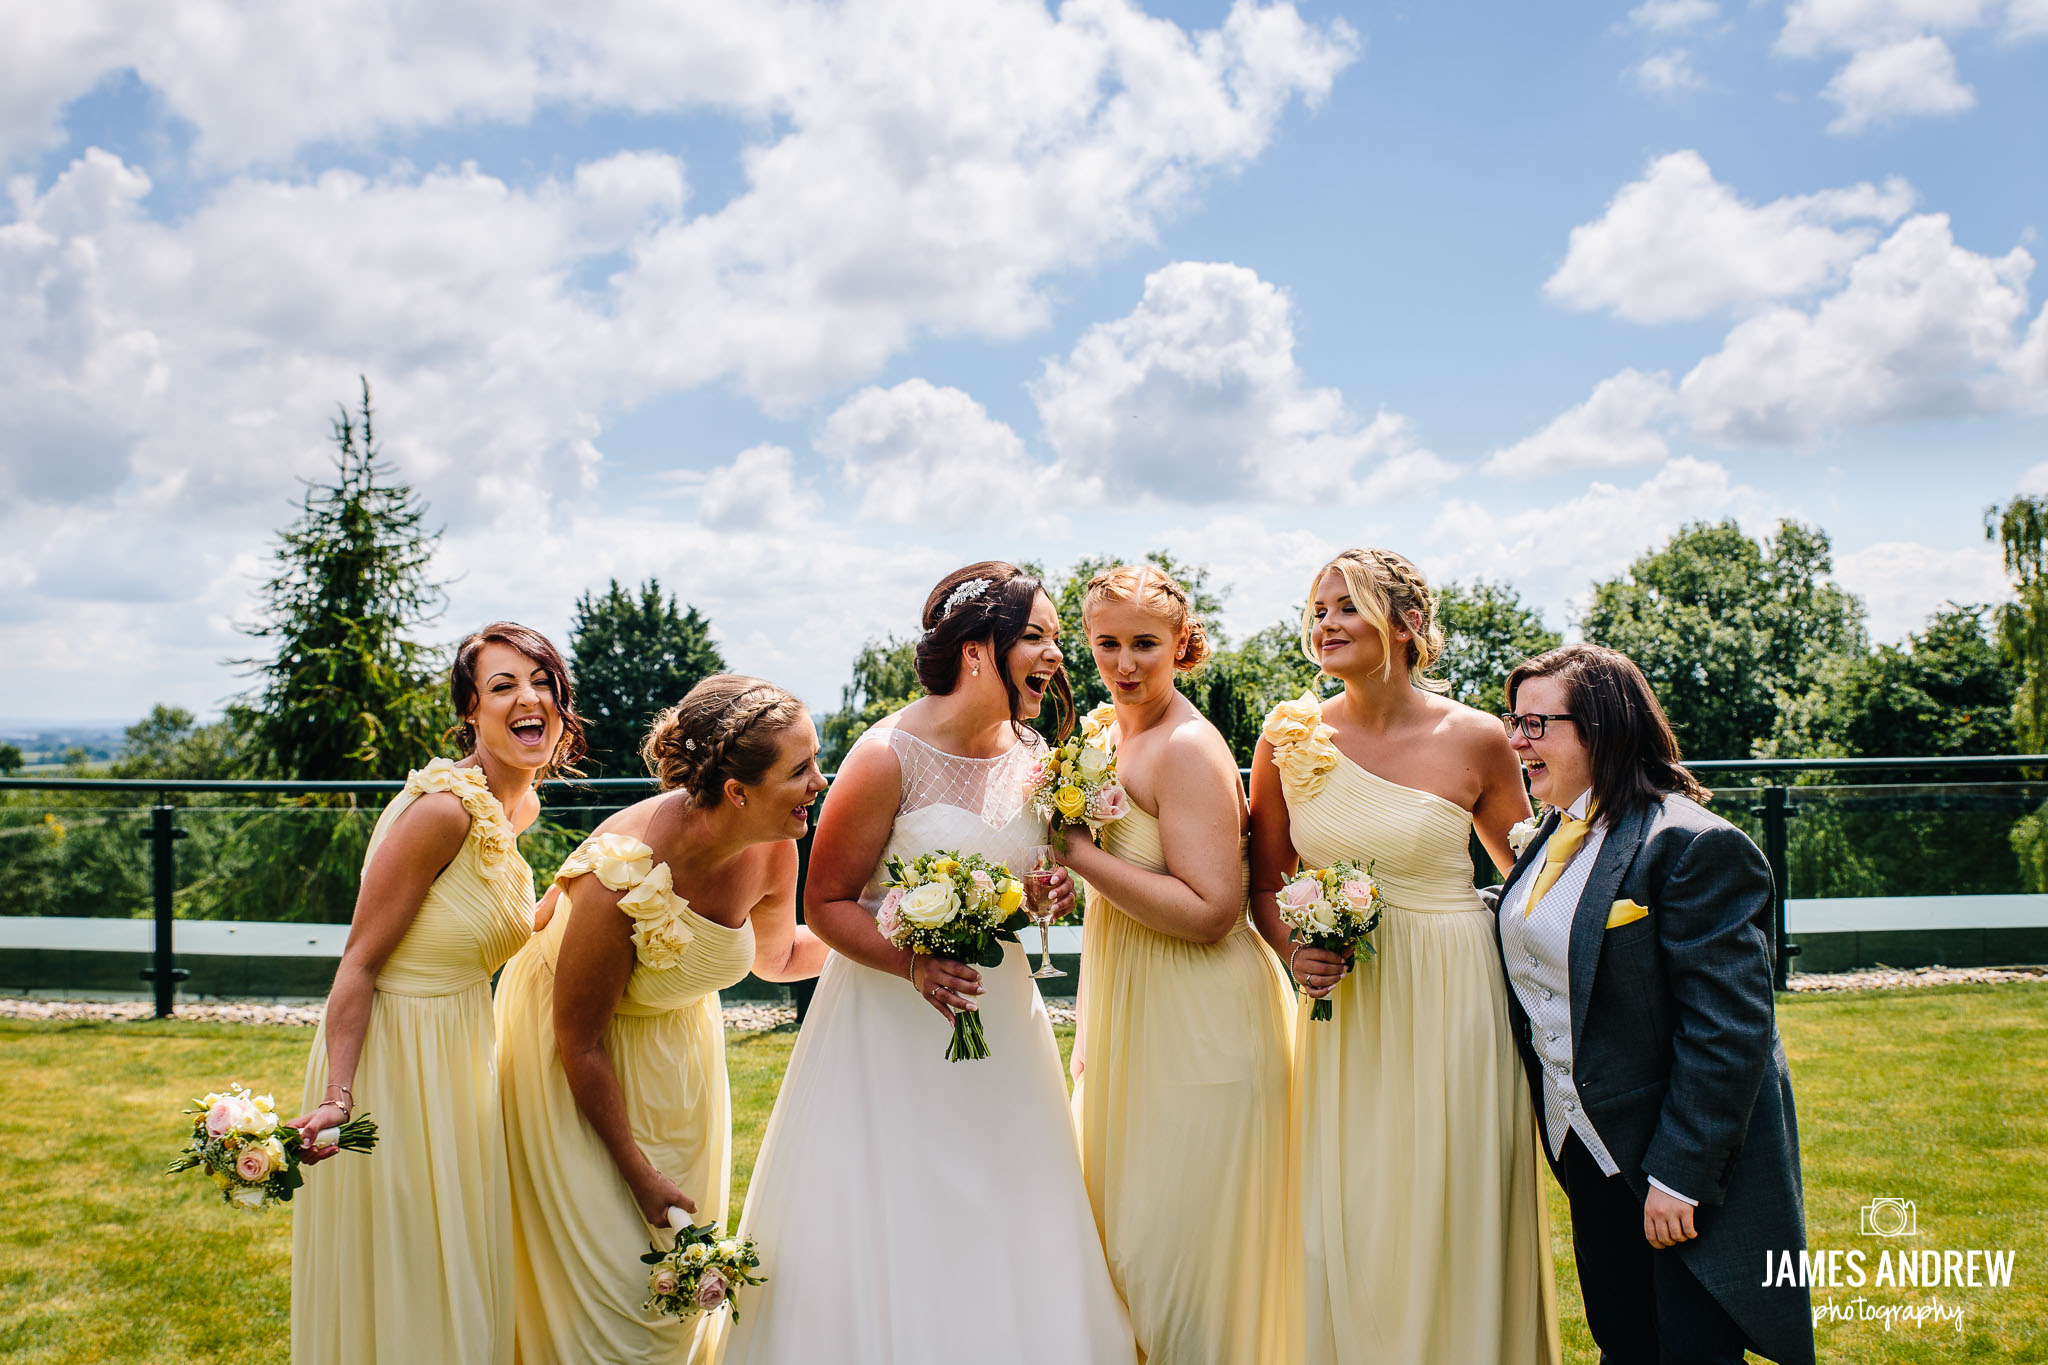 Cheshire bridesmaids summer wedding